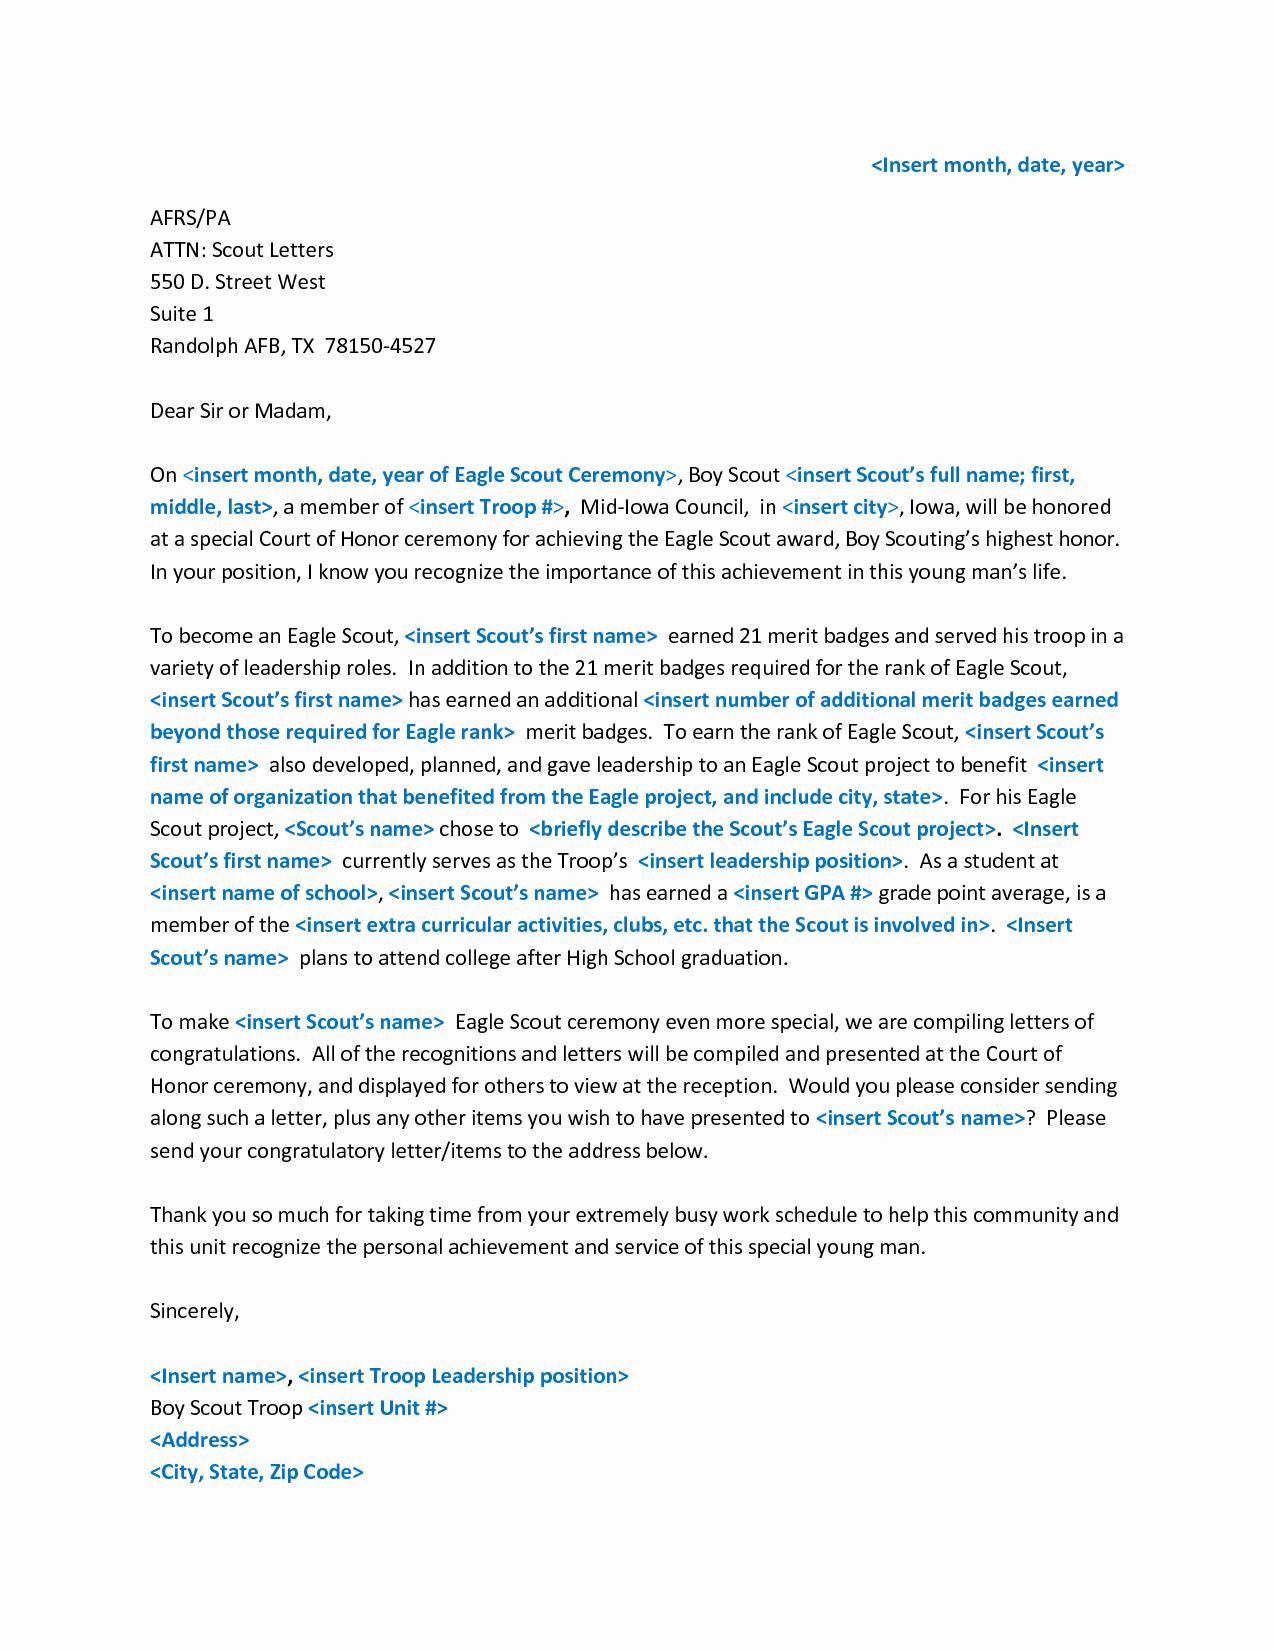 Eagle Scout Recommendation Letter Template Luxury Eagle Scout Letter Of Re Mendation Yahoo Image